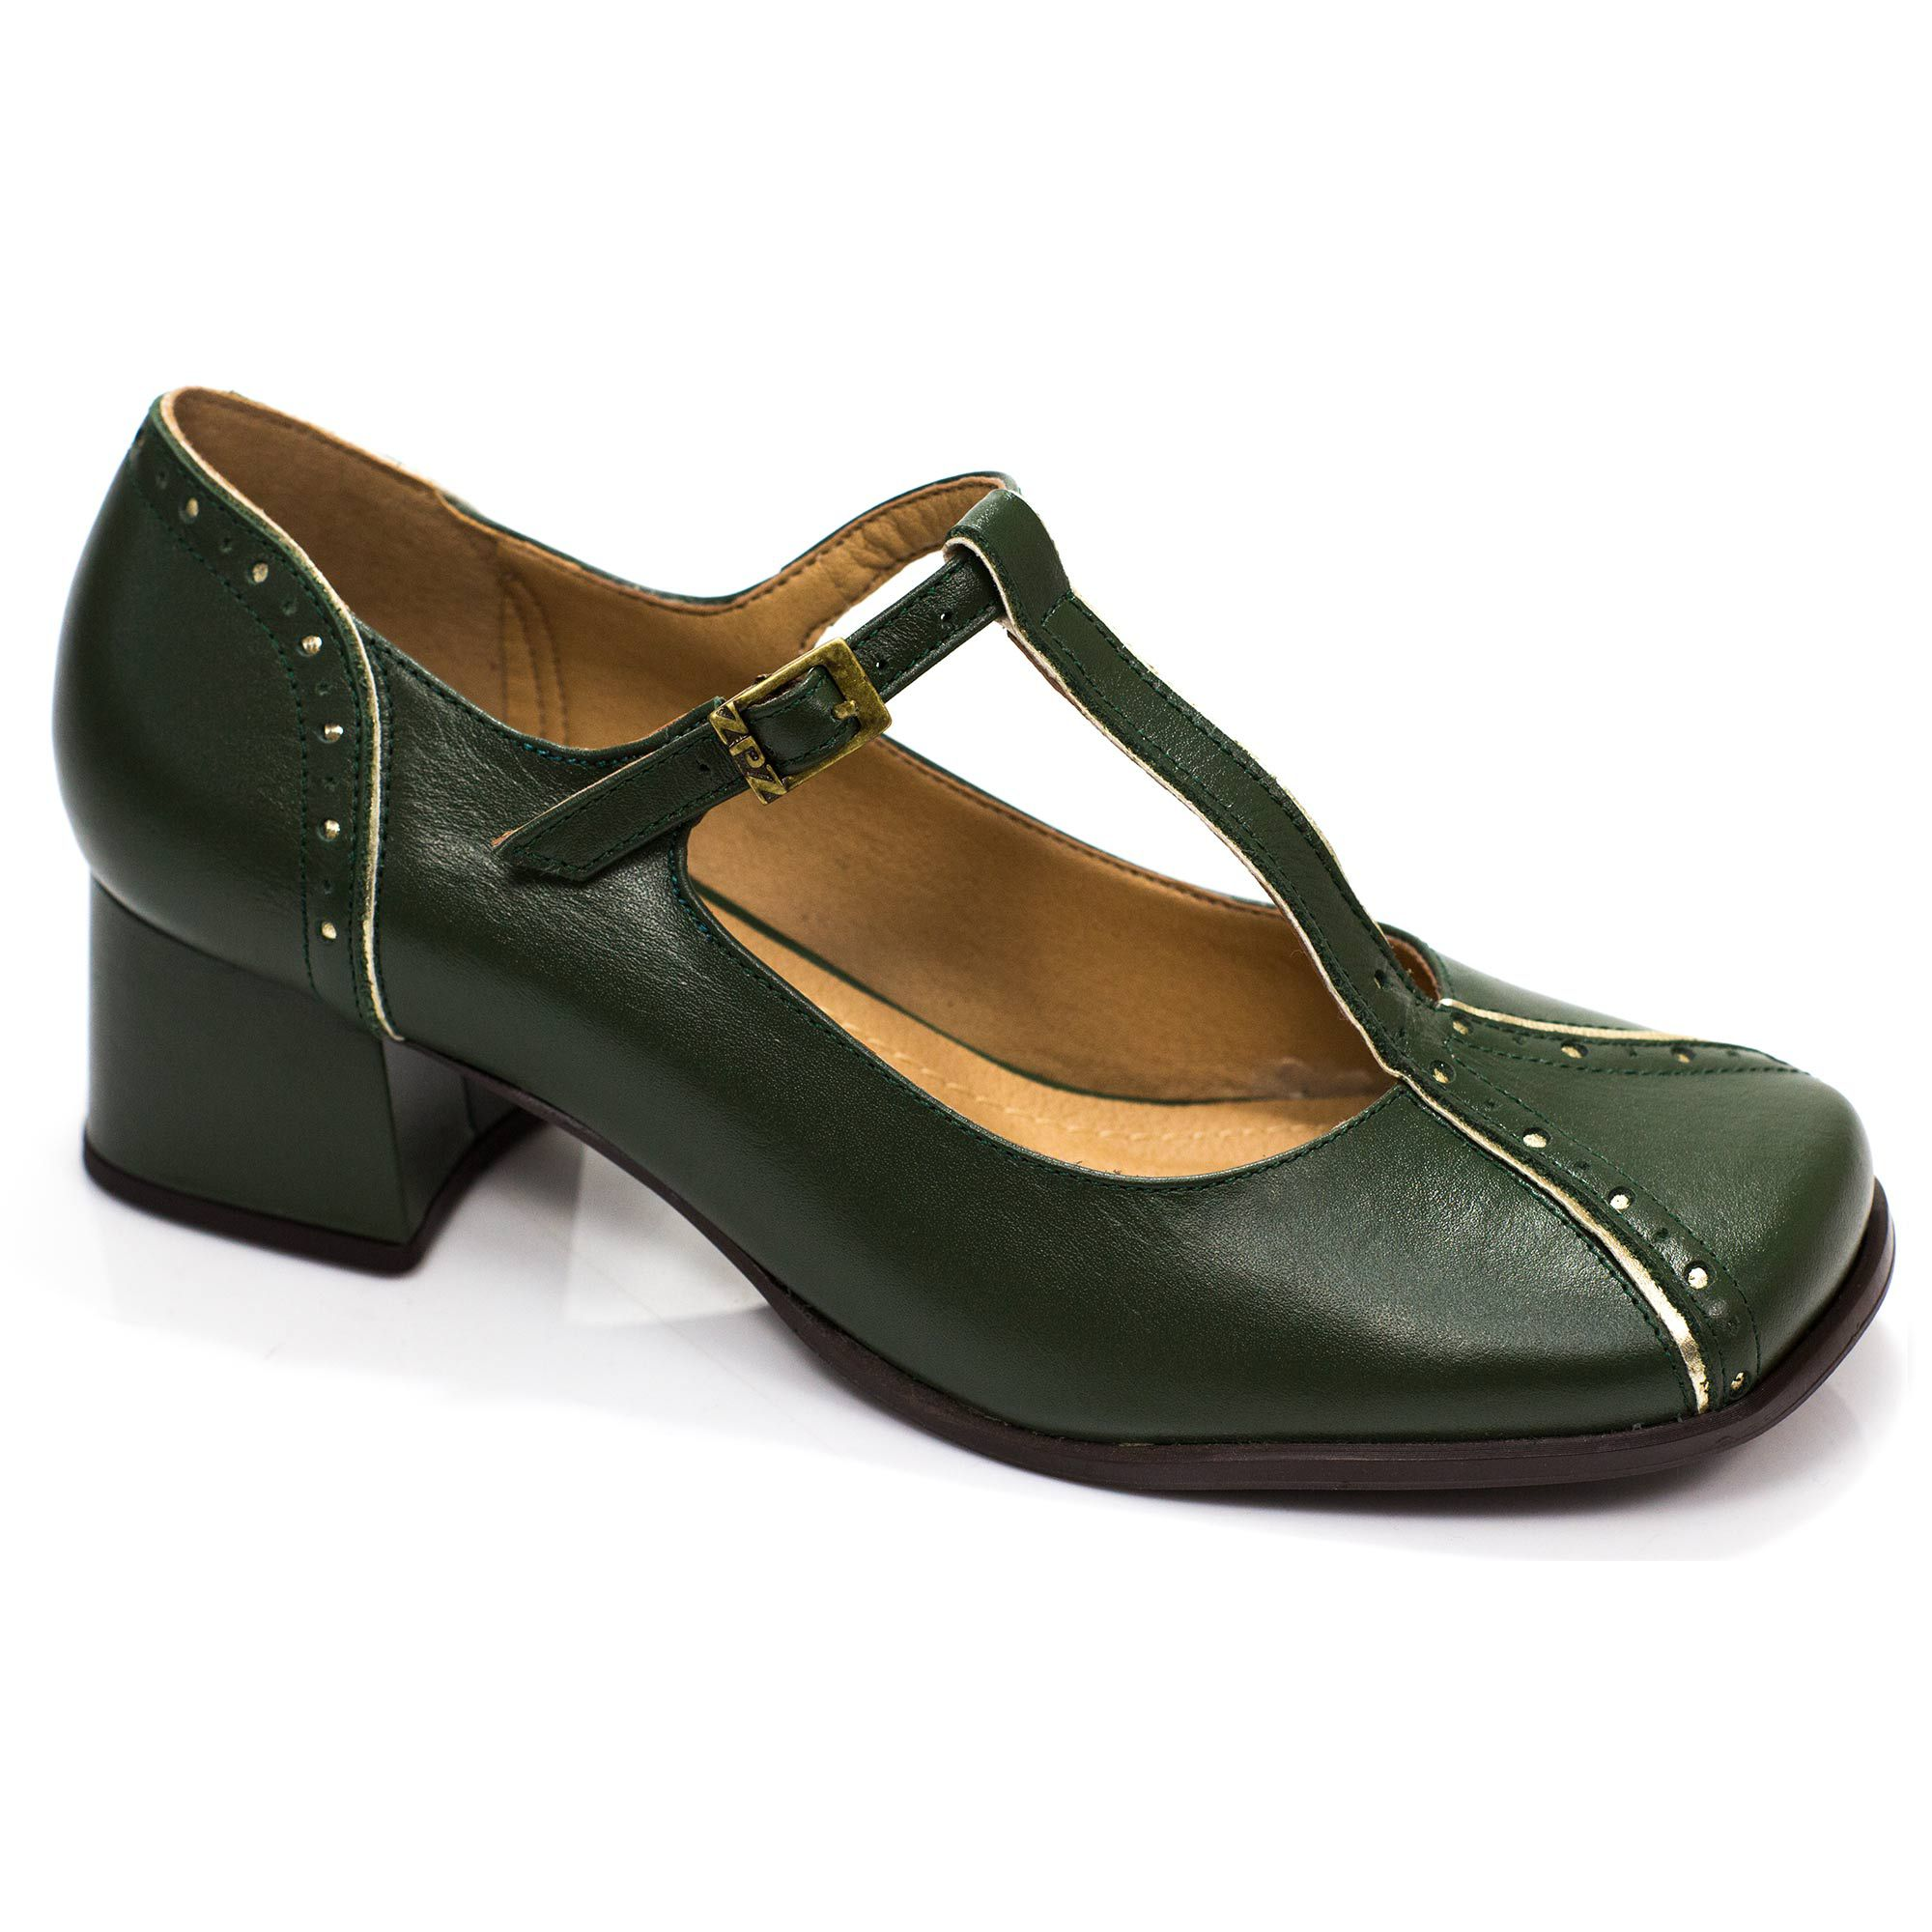 d9c98220bd ZPZ SHOES Sapato Retrô em couro Tiana